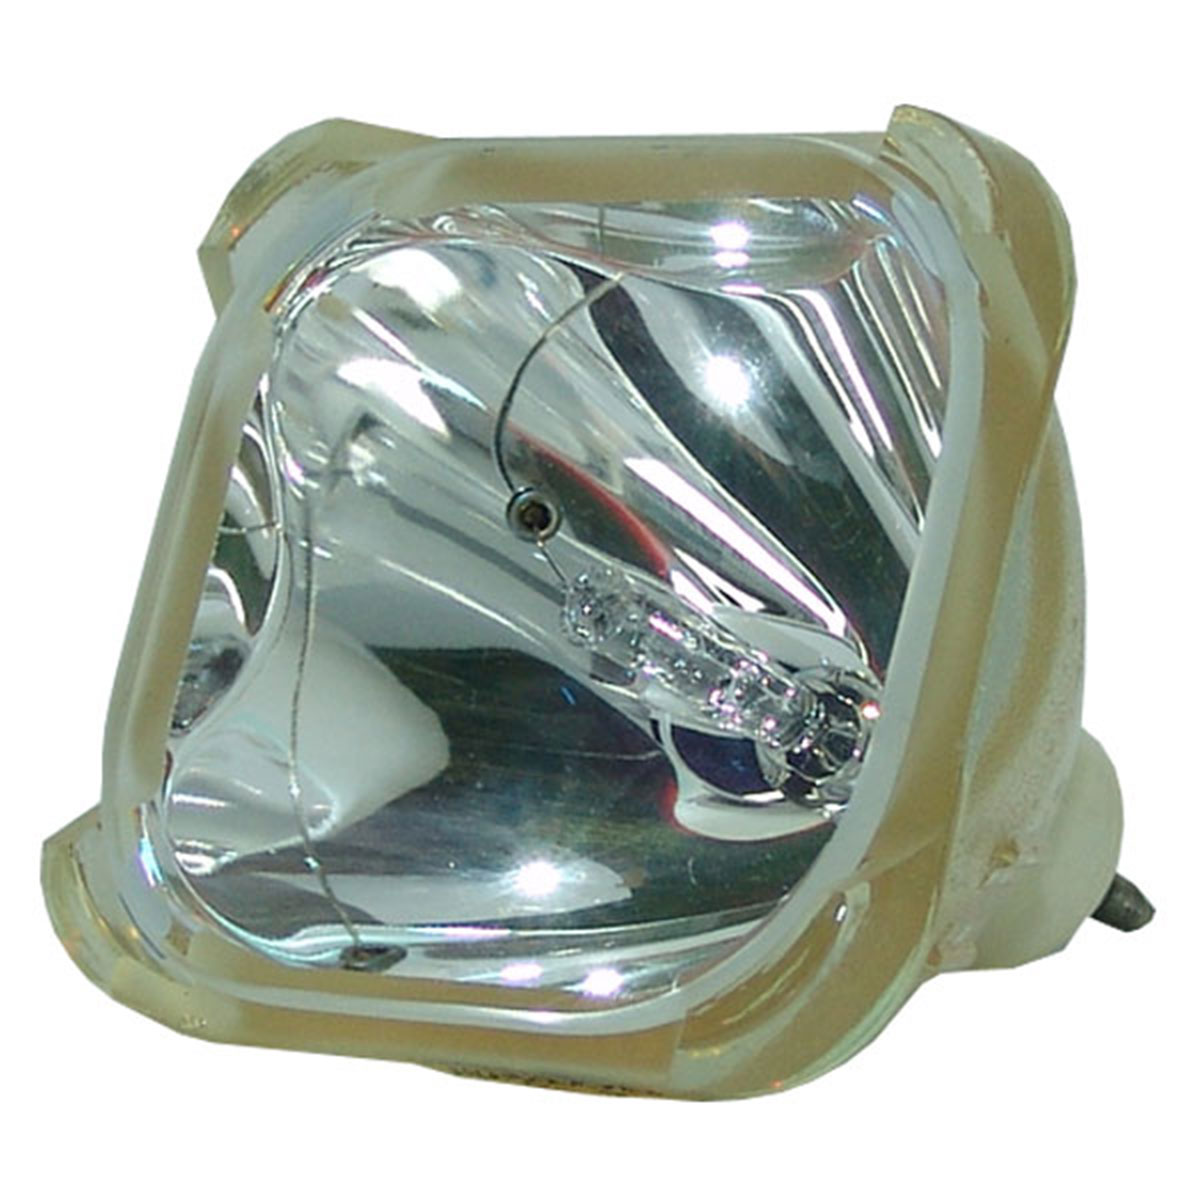 Original Philips Projector Lamp Replacement for InFocus LP690 (Bulb Only) - image 5 de 5